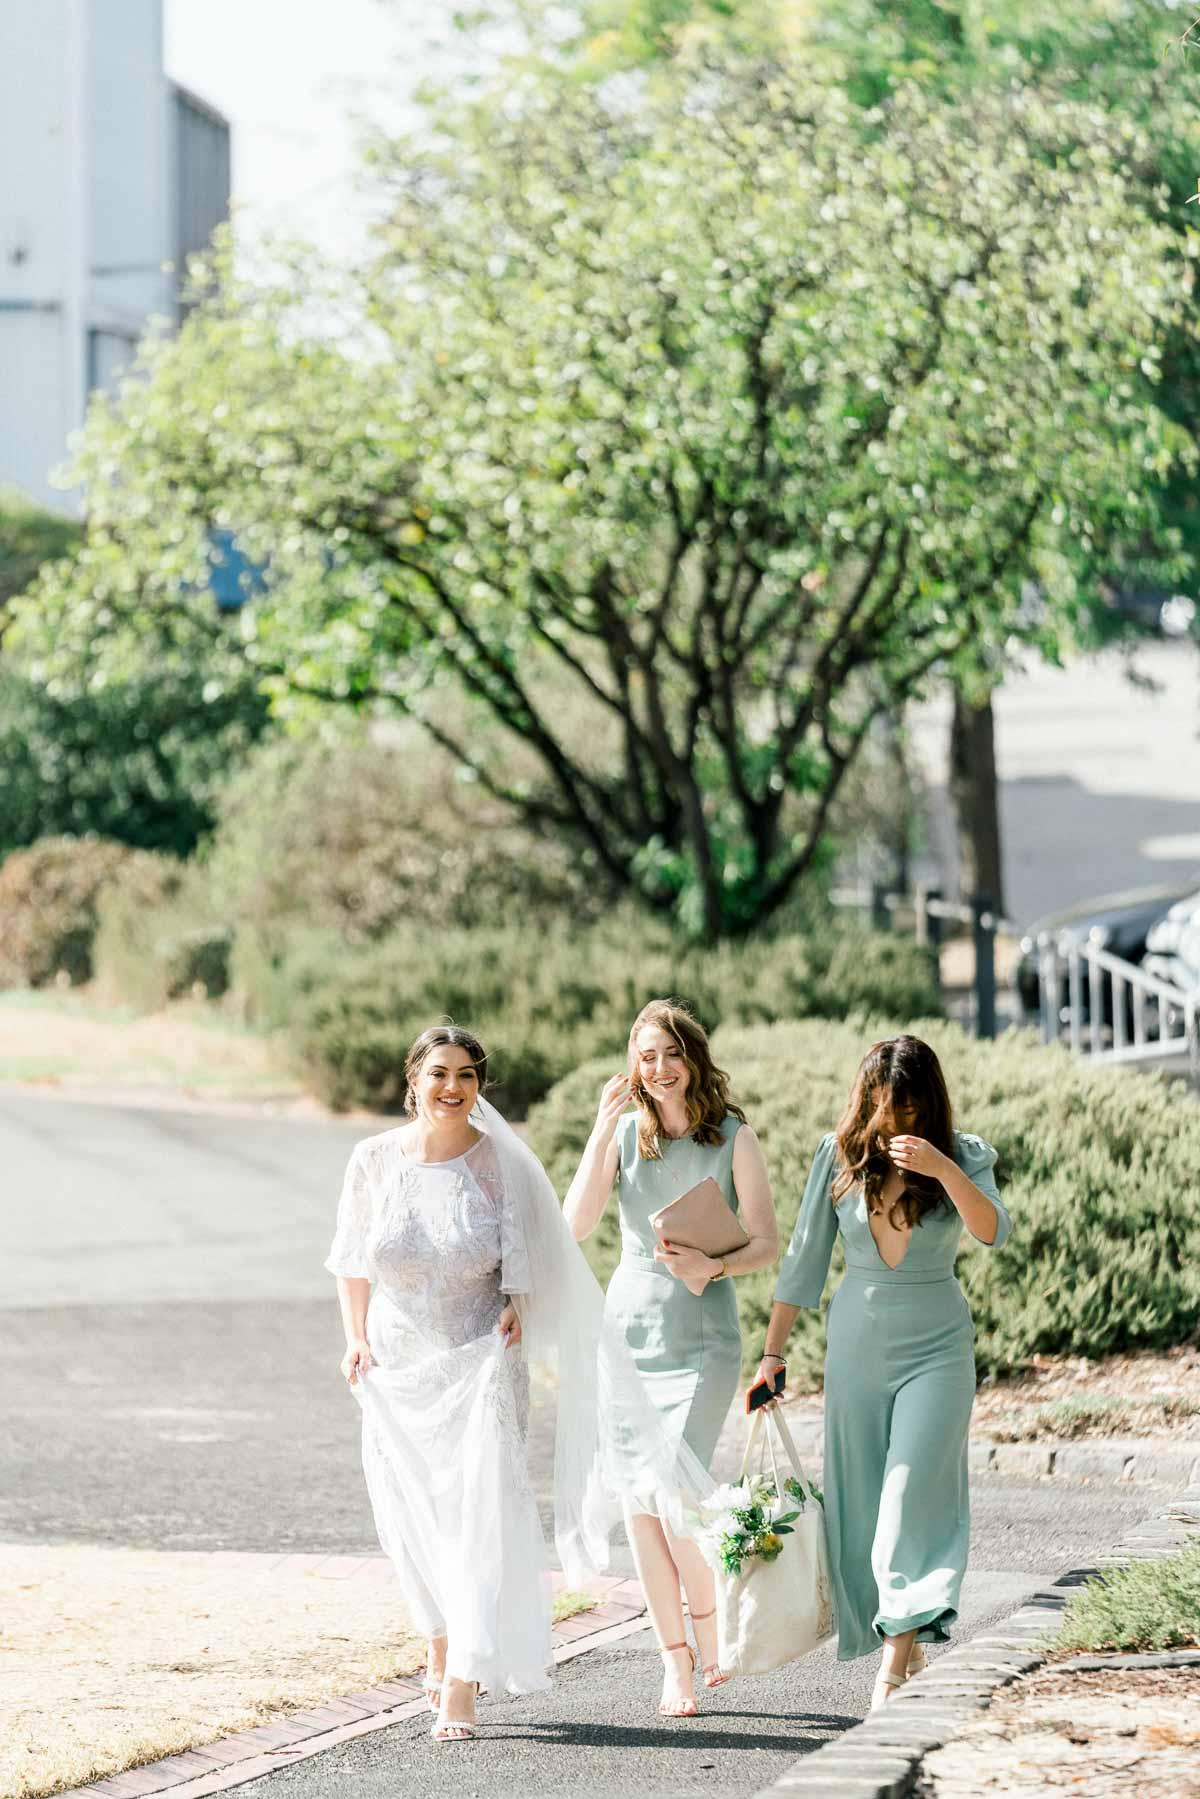 little-henri-cafe-wedding-thornbury-heart+soul-weddings-jane-aaron-05128.jpg